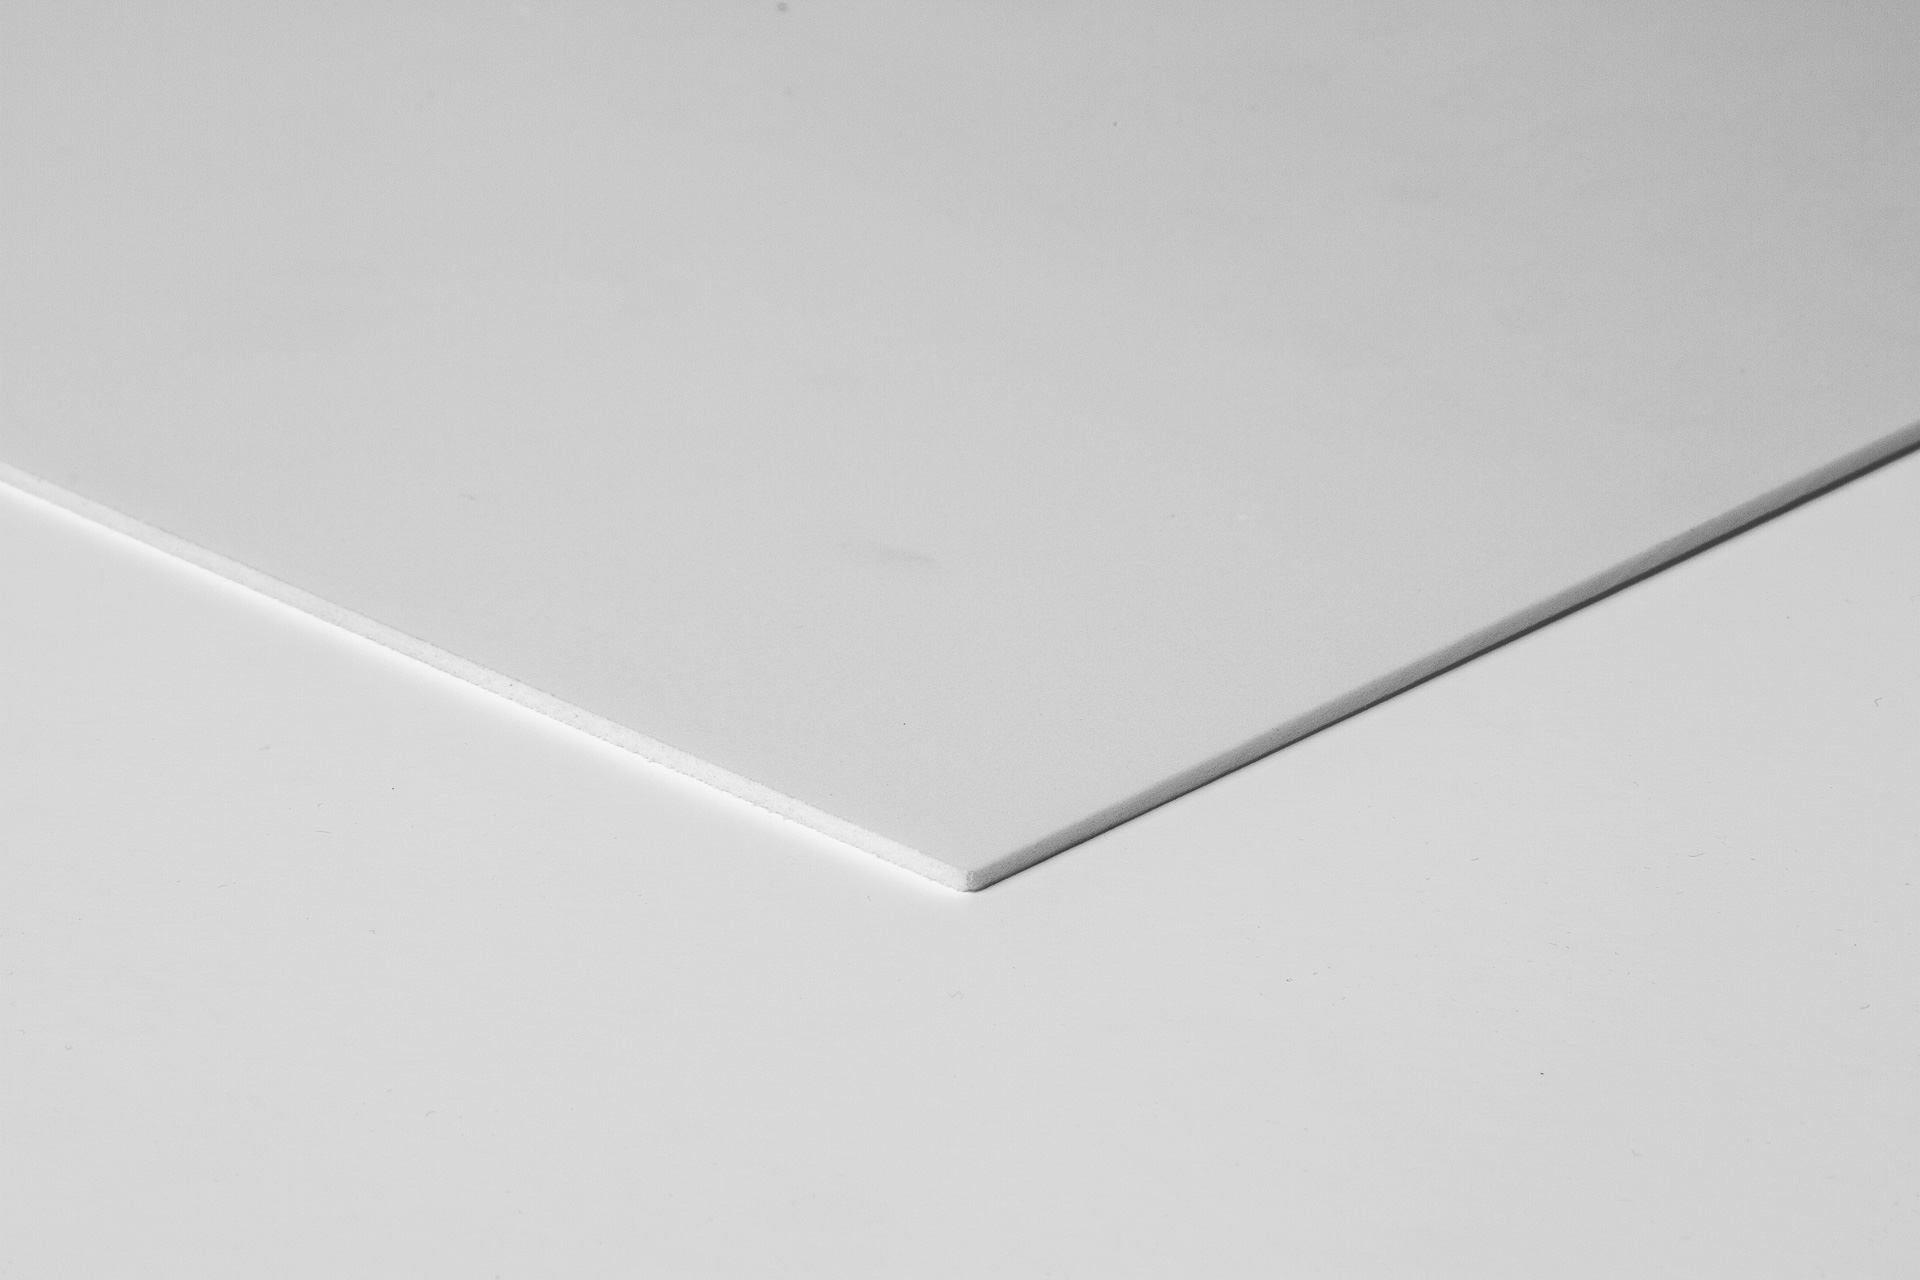 Forex classic Platten - geschlossenzellige Hartschaumstoffplatten